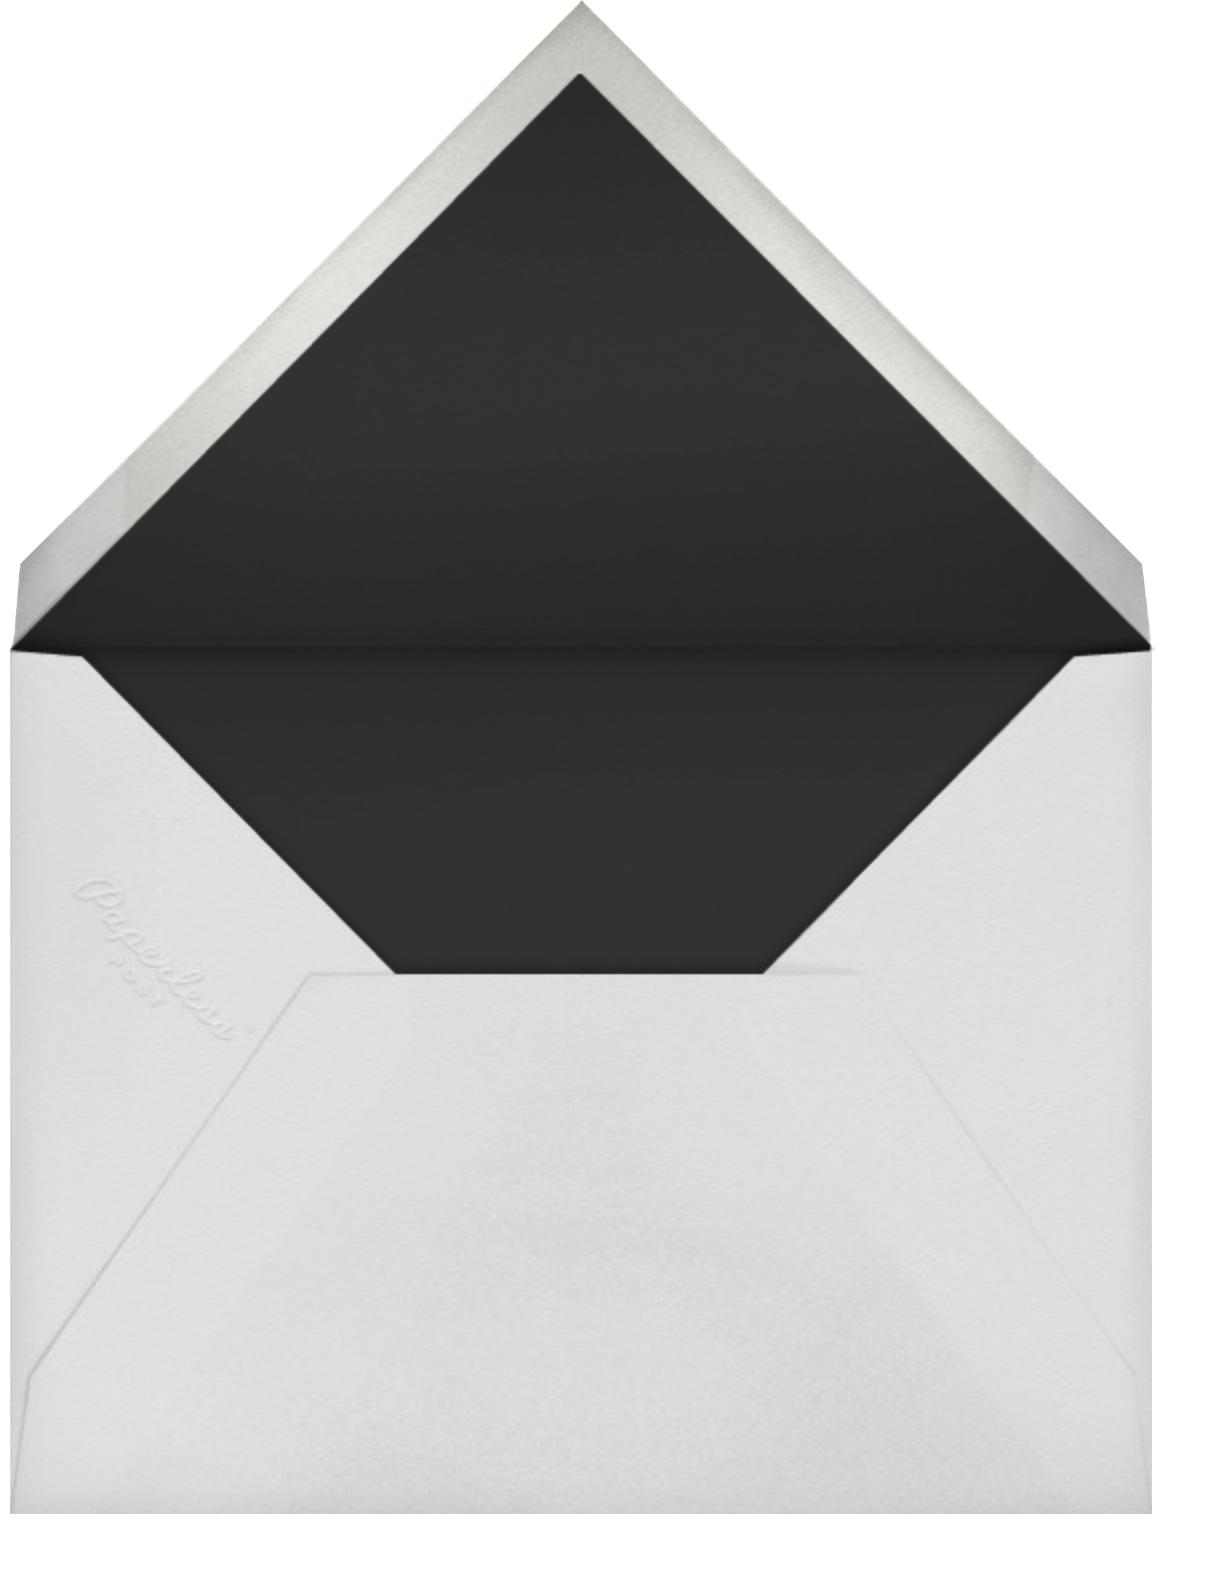 Principle - Black - Vera Wang - Engagement party - envelope back